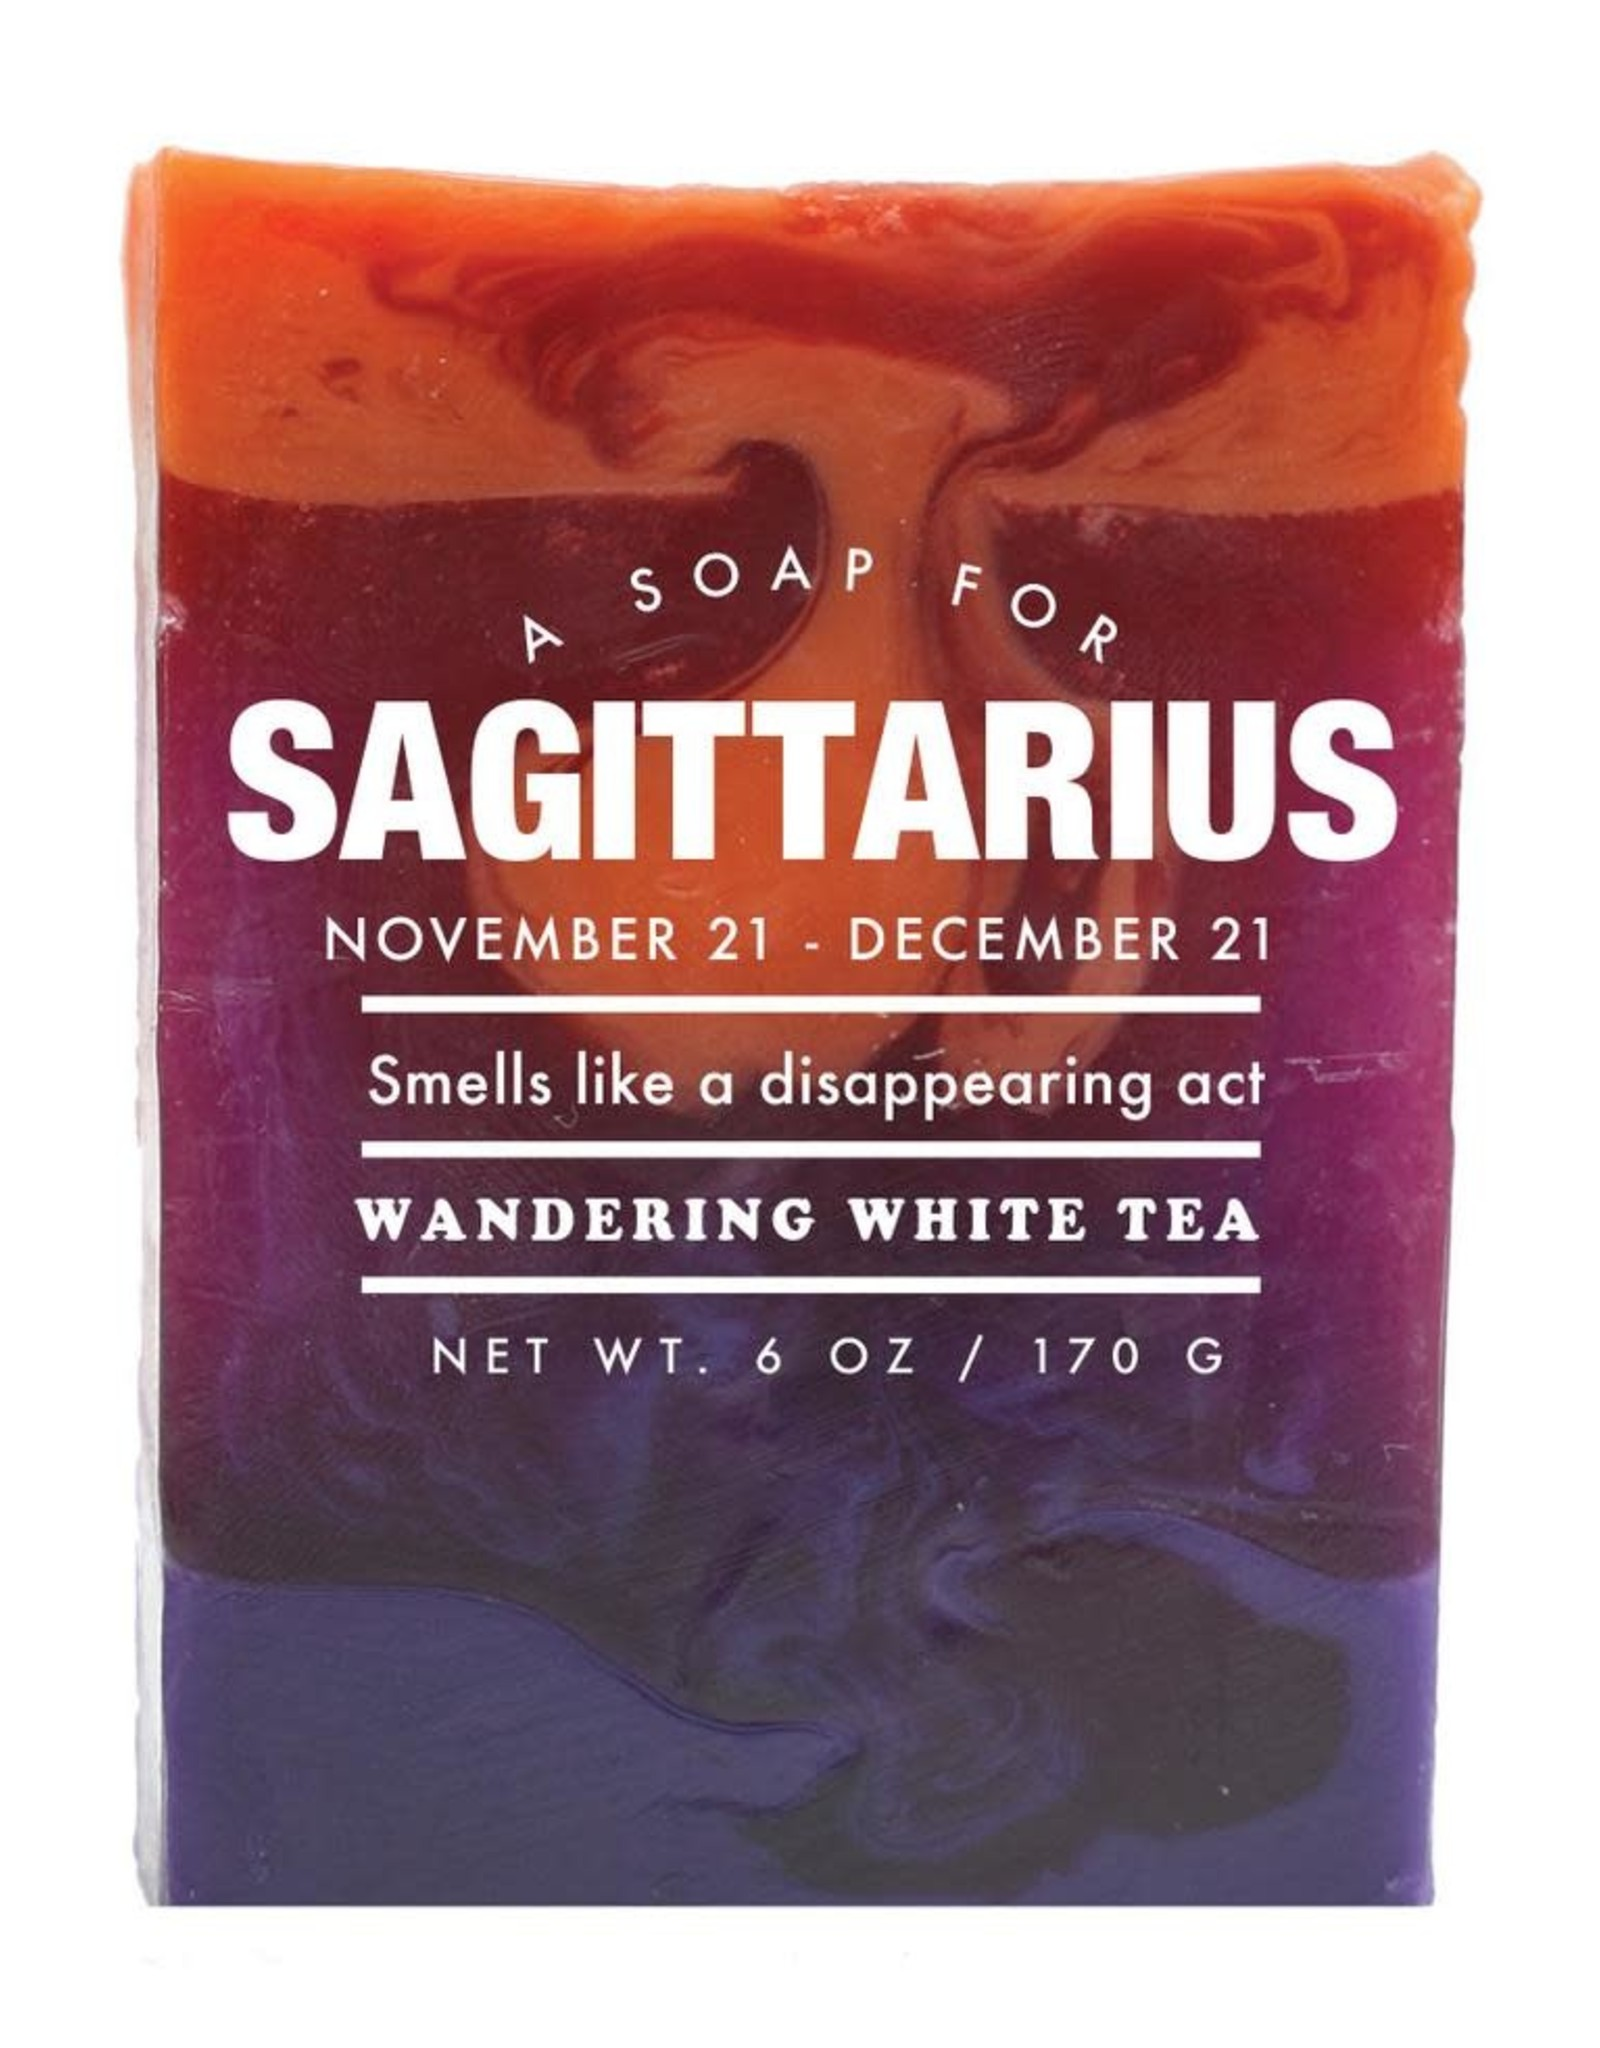 Whiskey River Soap WER - Soap/ Sagittarius 6 oz